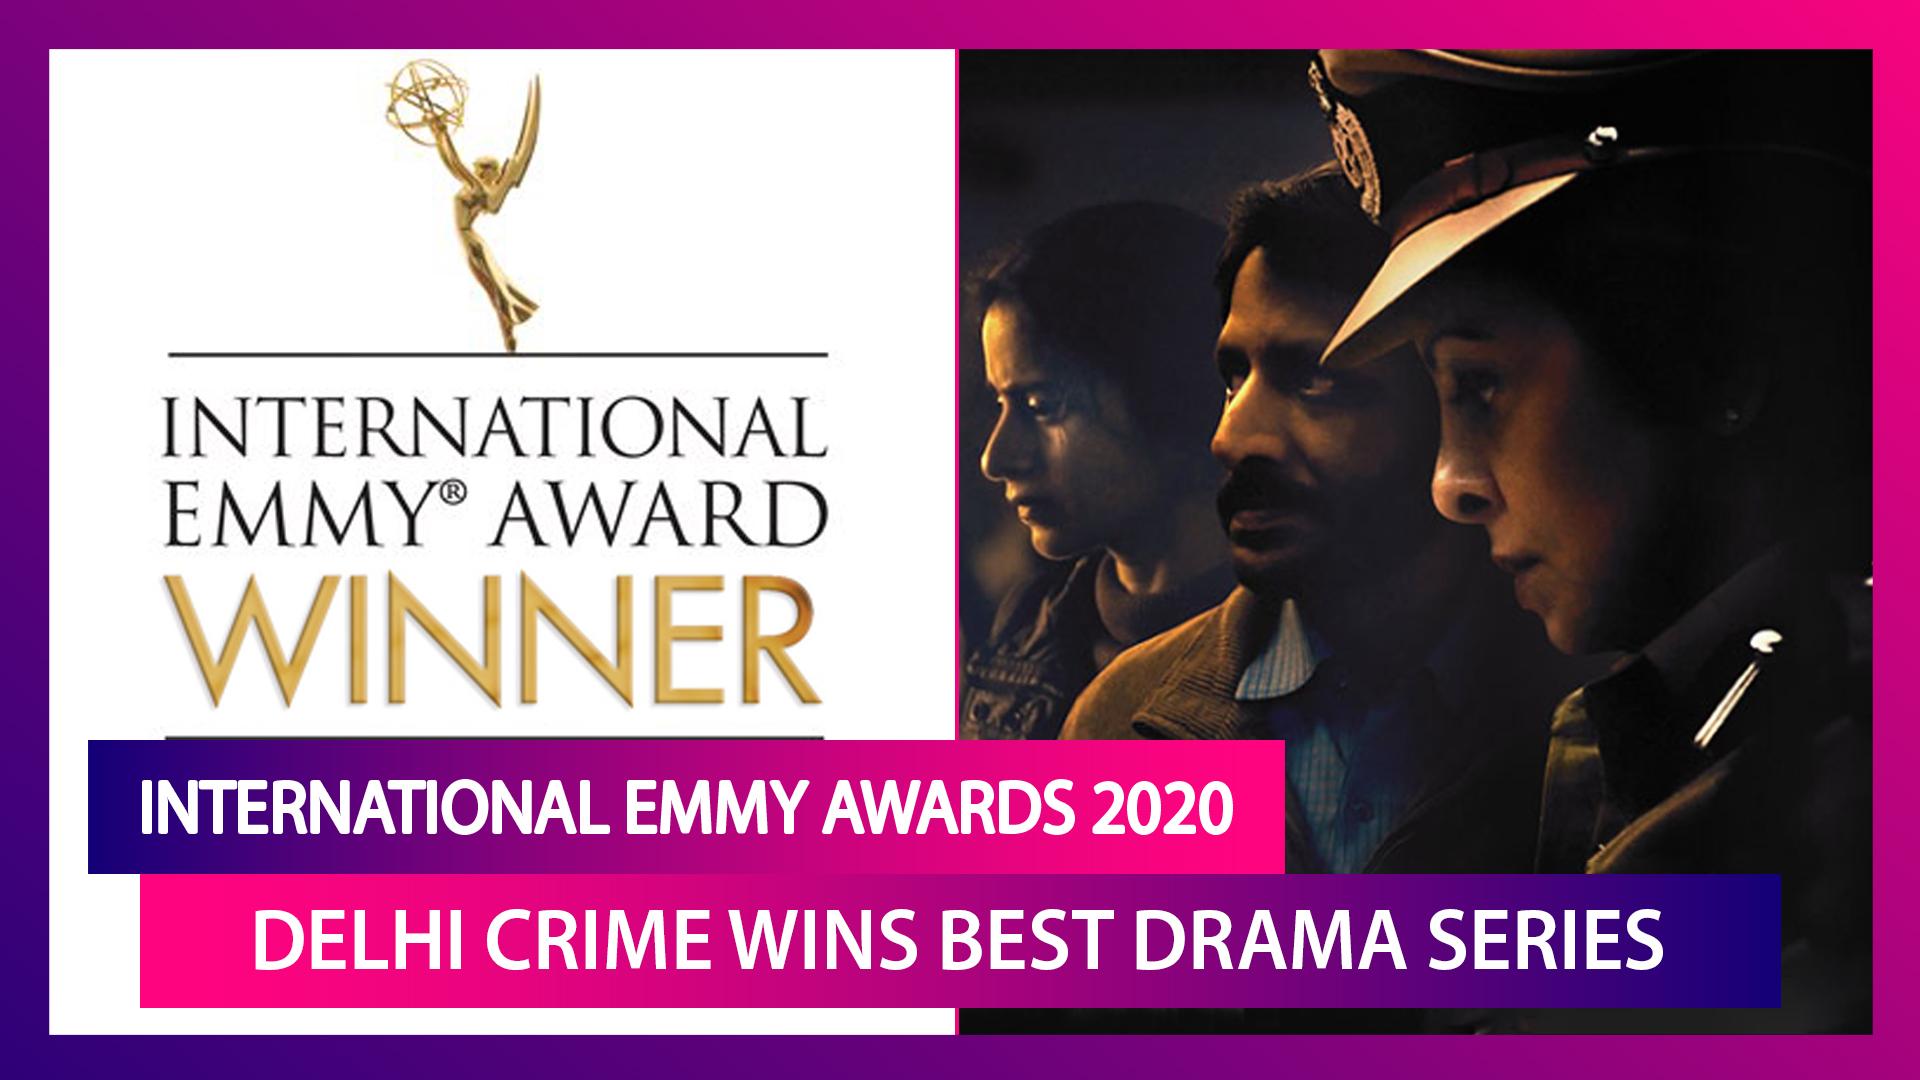 International Emmy Awards 2020: Delhi Crime Wins Best Drama Series Award; Shefali Shah's Reaction Just Cannot Be Missed!